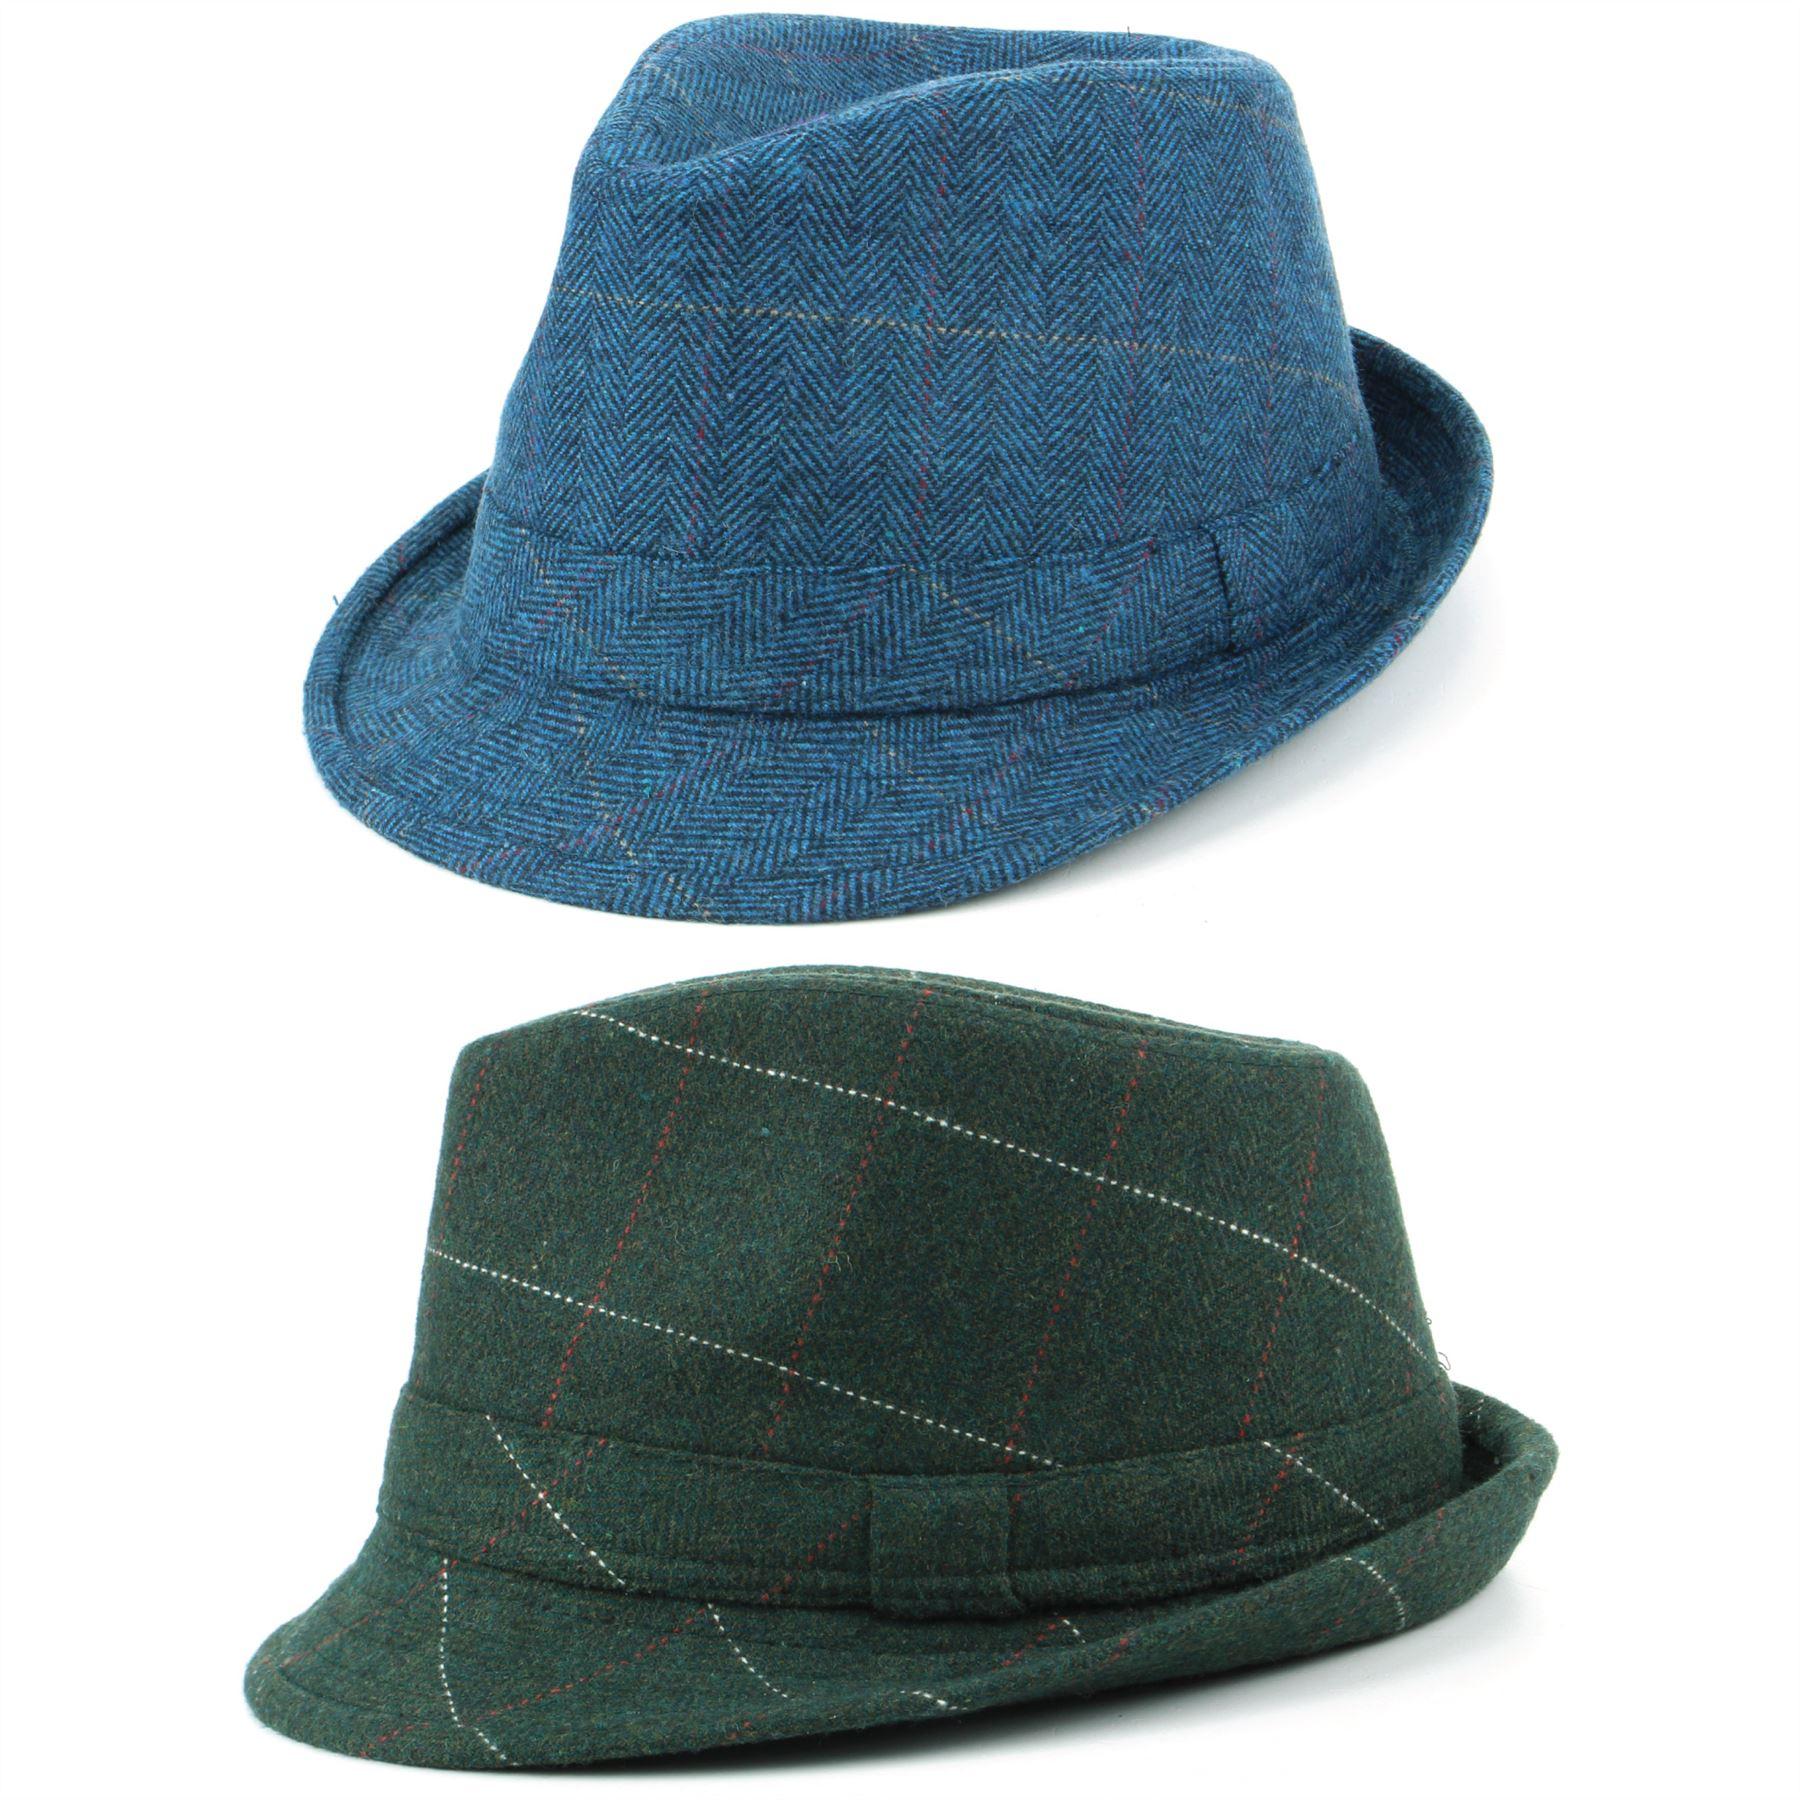 324f45c6d90cba Details about Tweed Trilby Fedora Hat BLUE GREEN Wool Hawkins Fabric  Herringbone Men Ladies